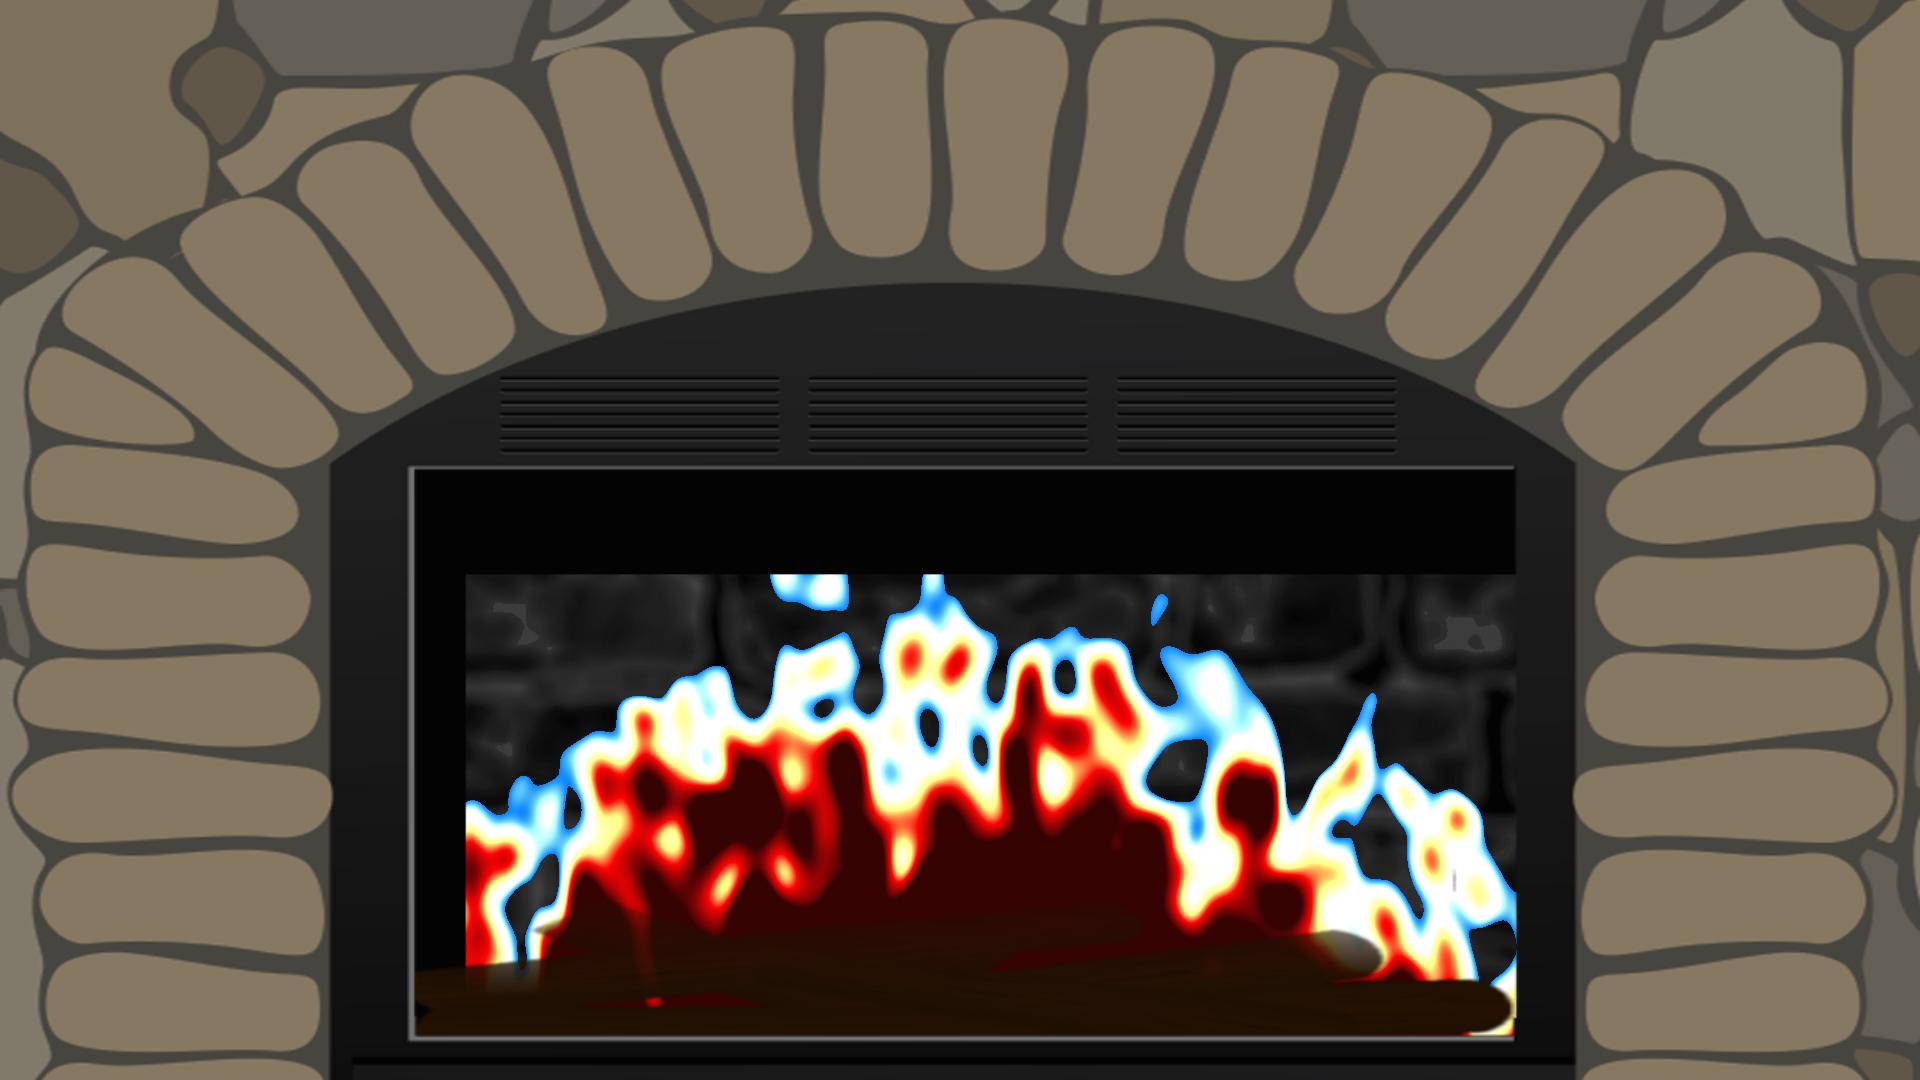 Sensory Flames - Free Fireplace for your TV screenshot 2